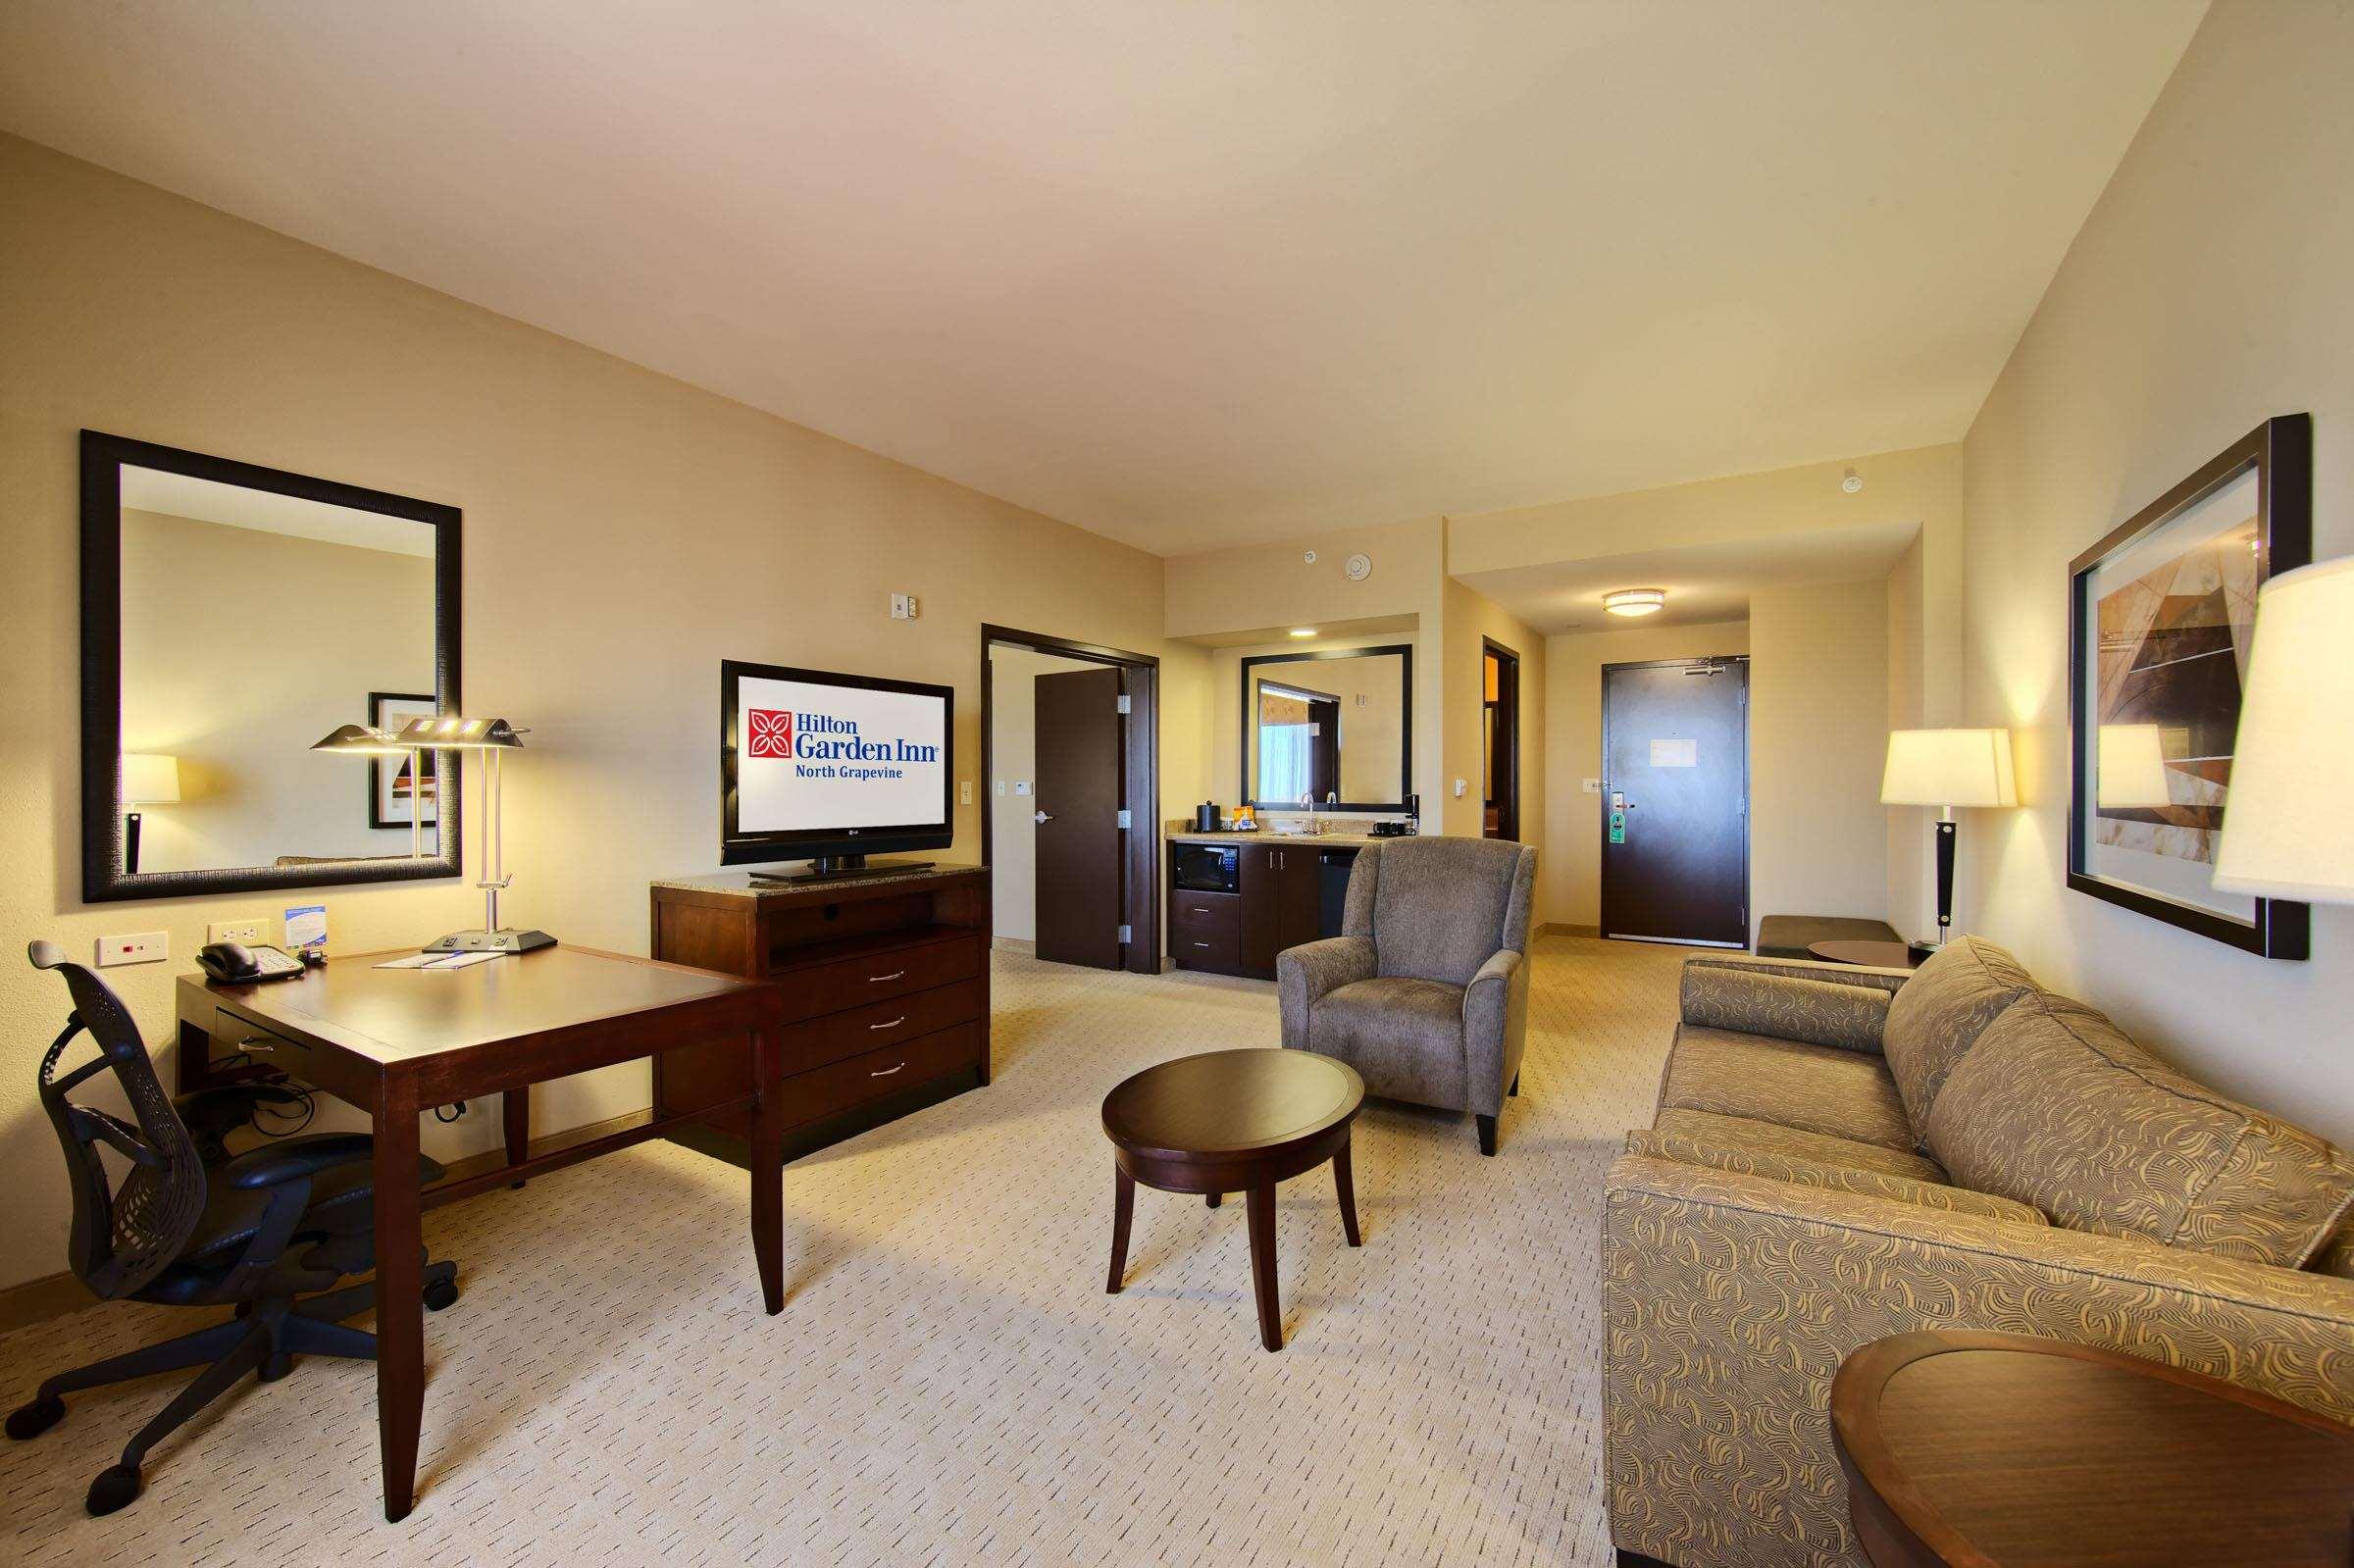 Hilton Garden Inn DFW North Grapevine image 37